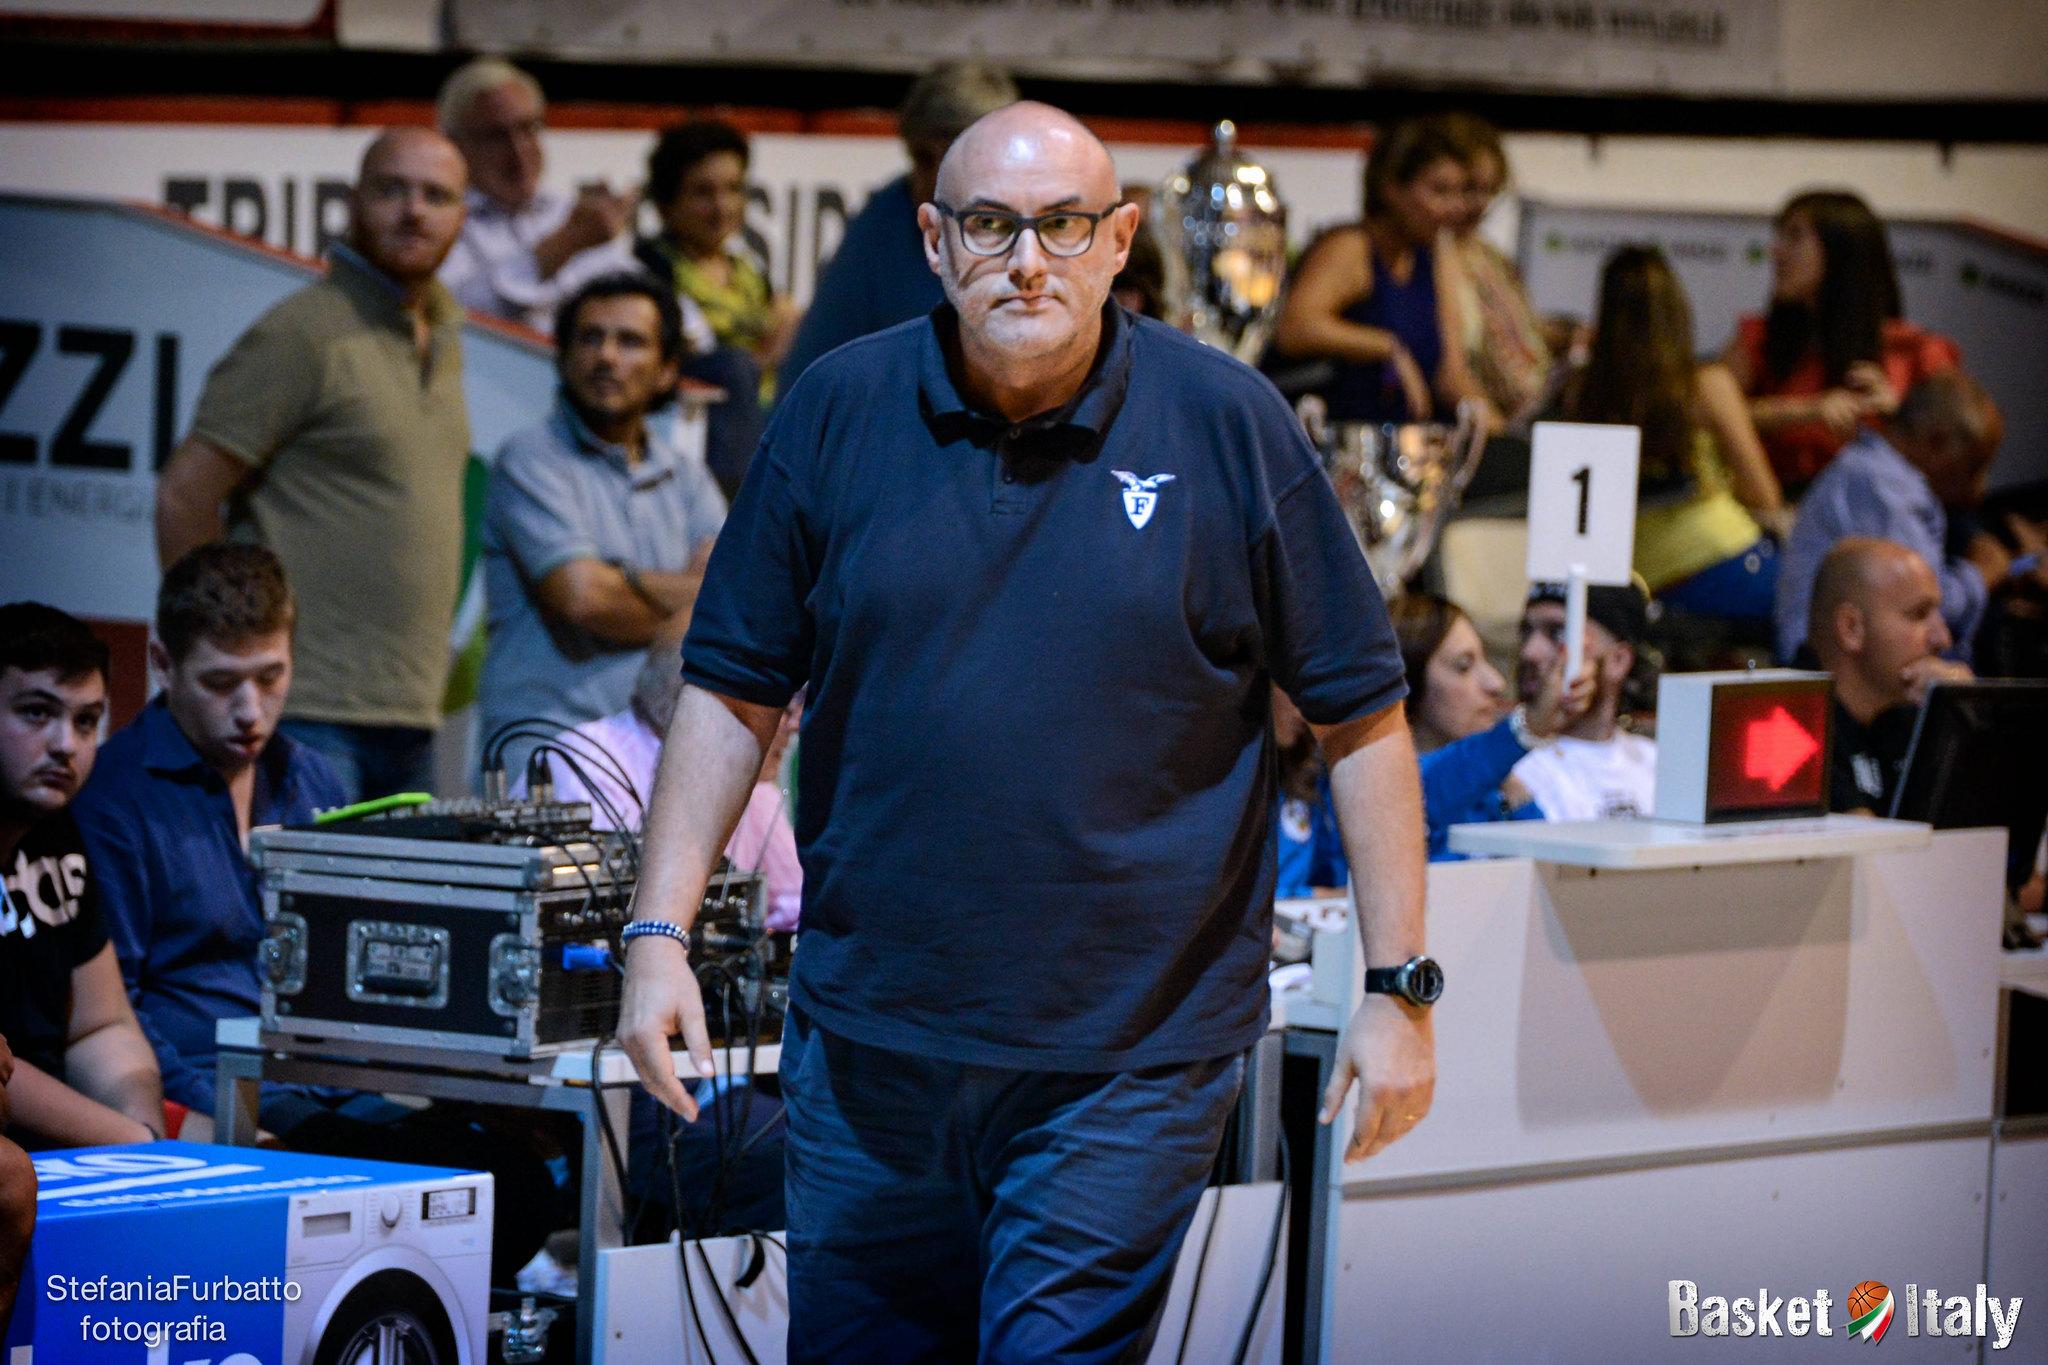 A2 Est – Matteo Boniciolli torna a Udine vent'anni dopo